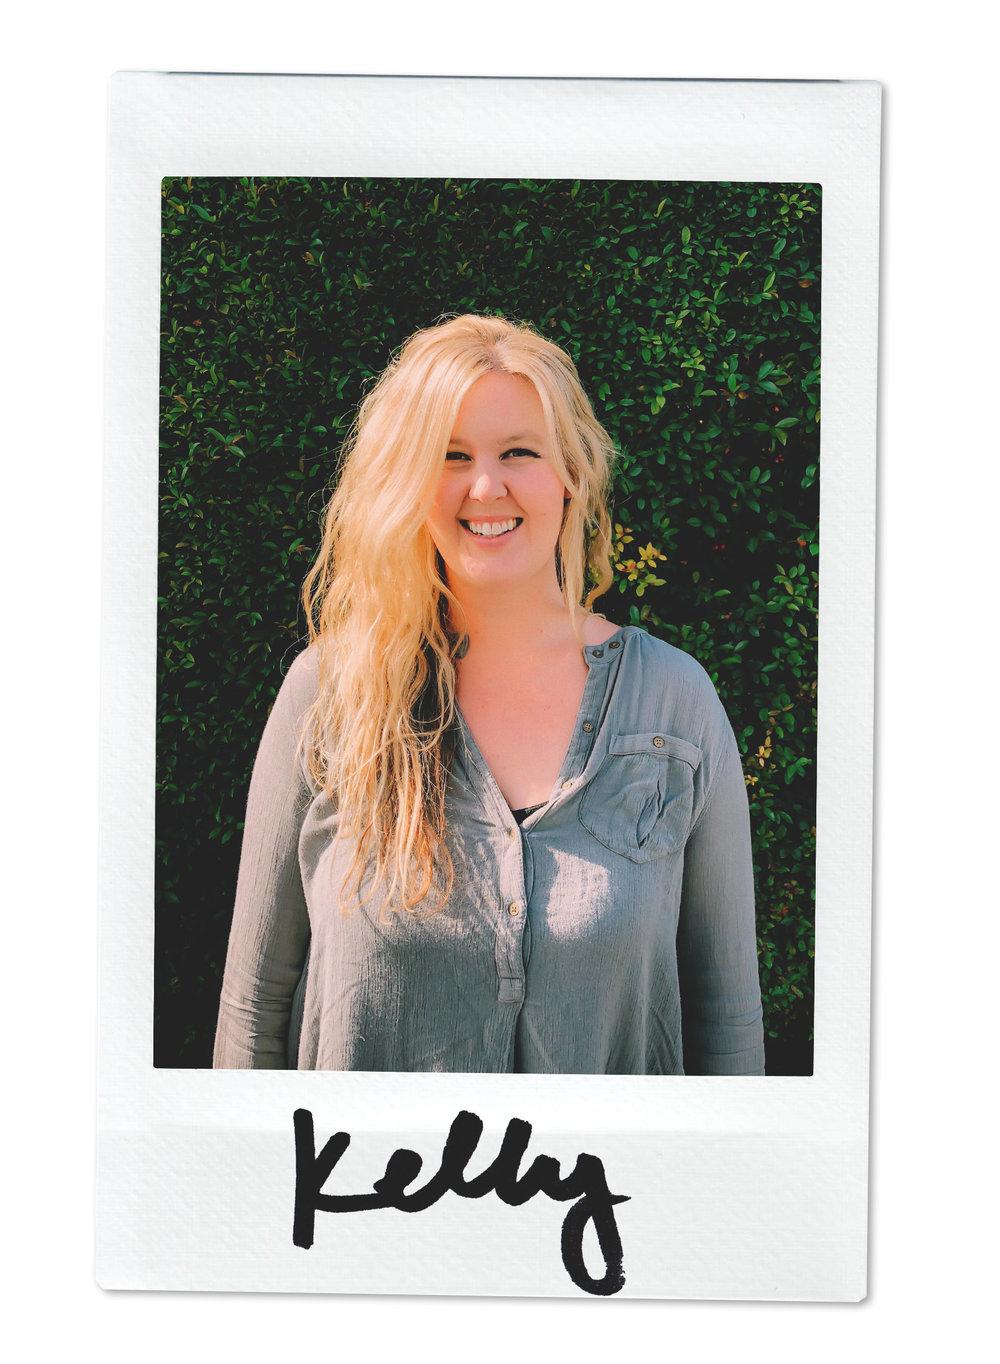 Kelly-02.jpg